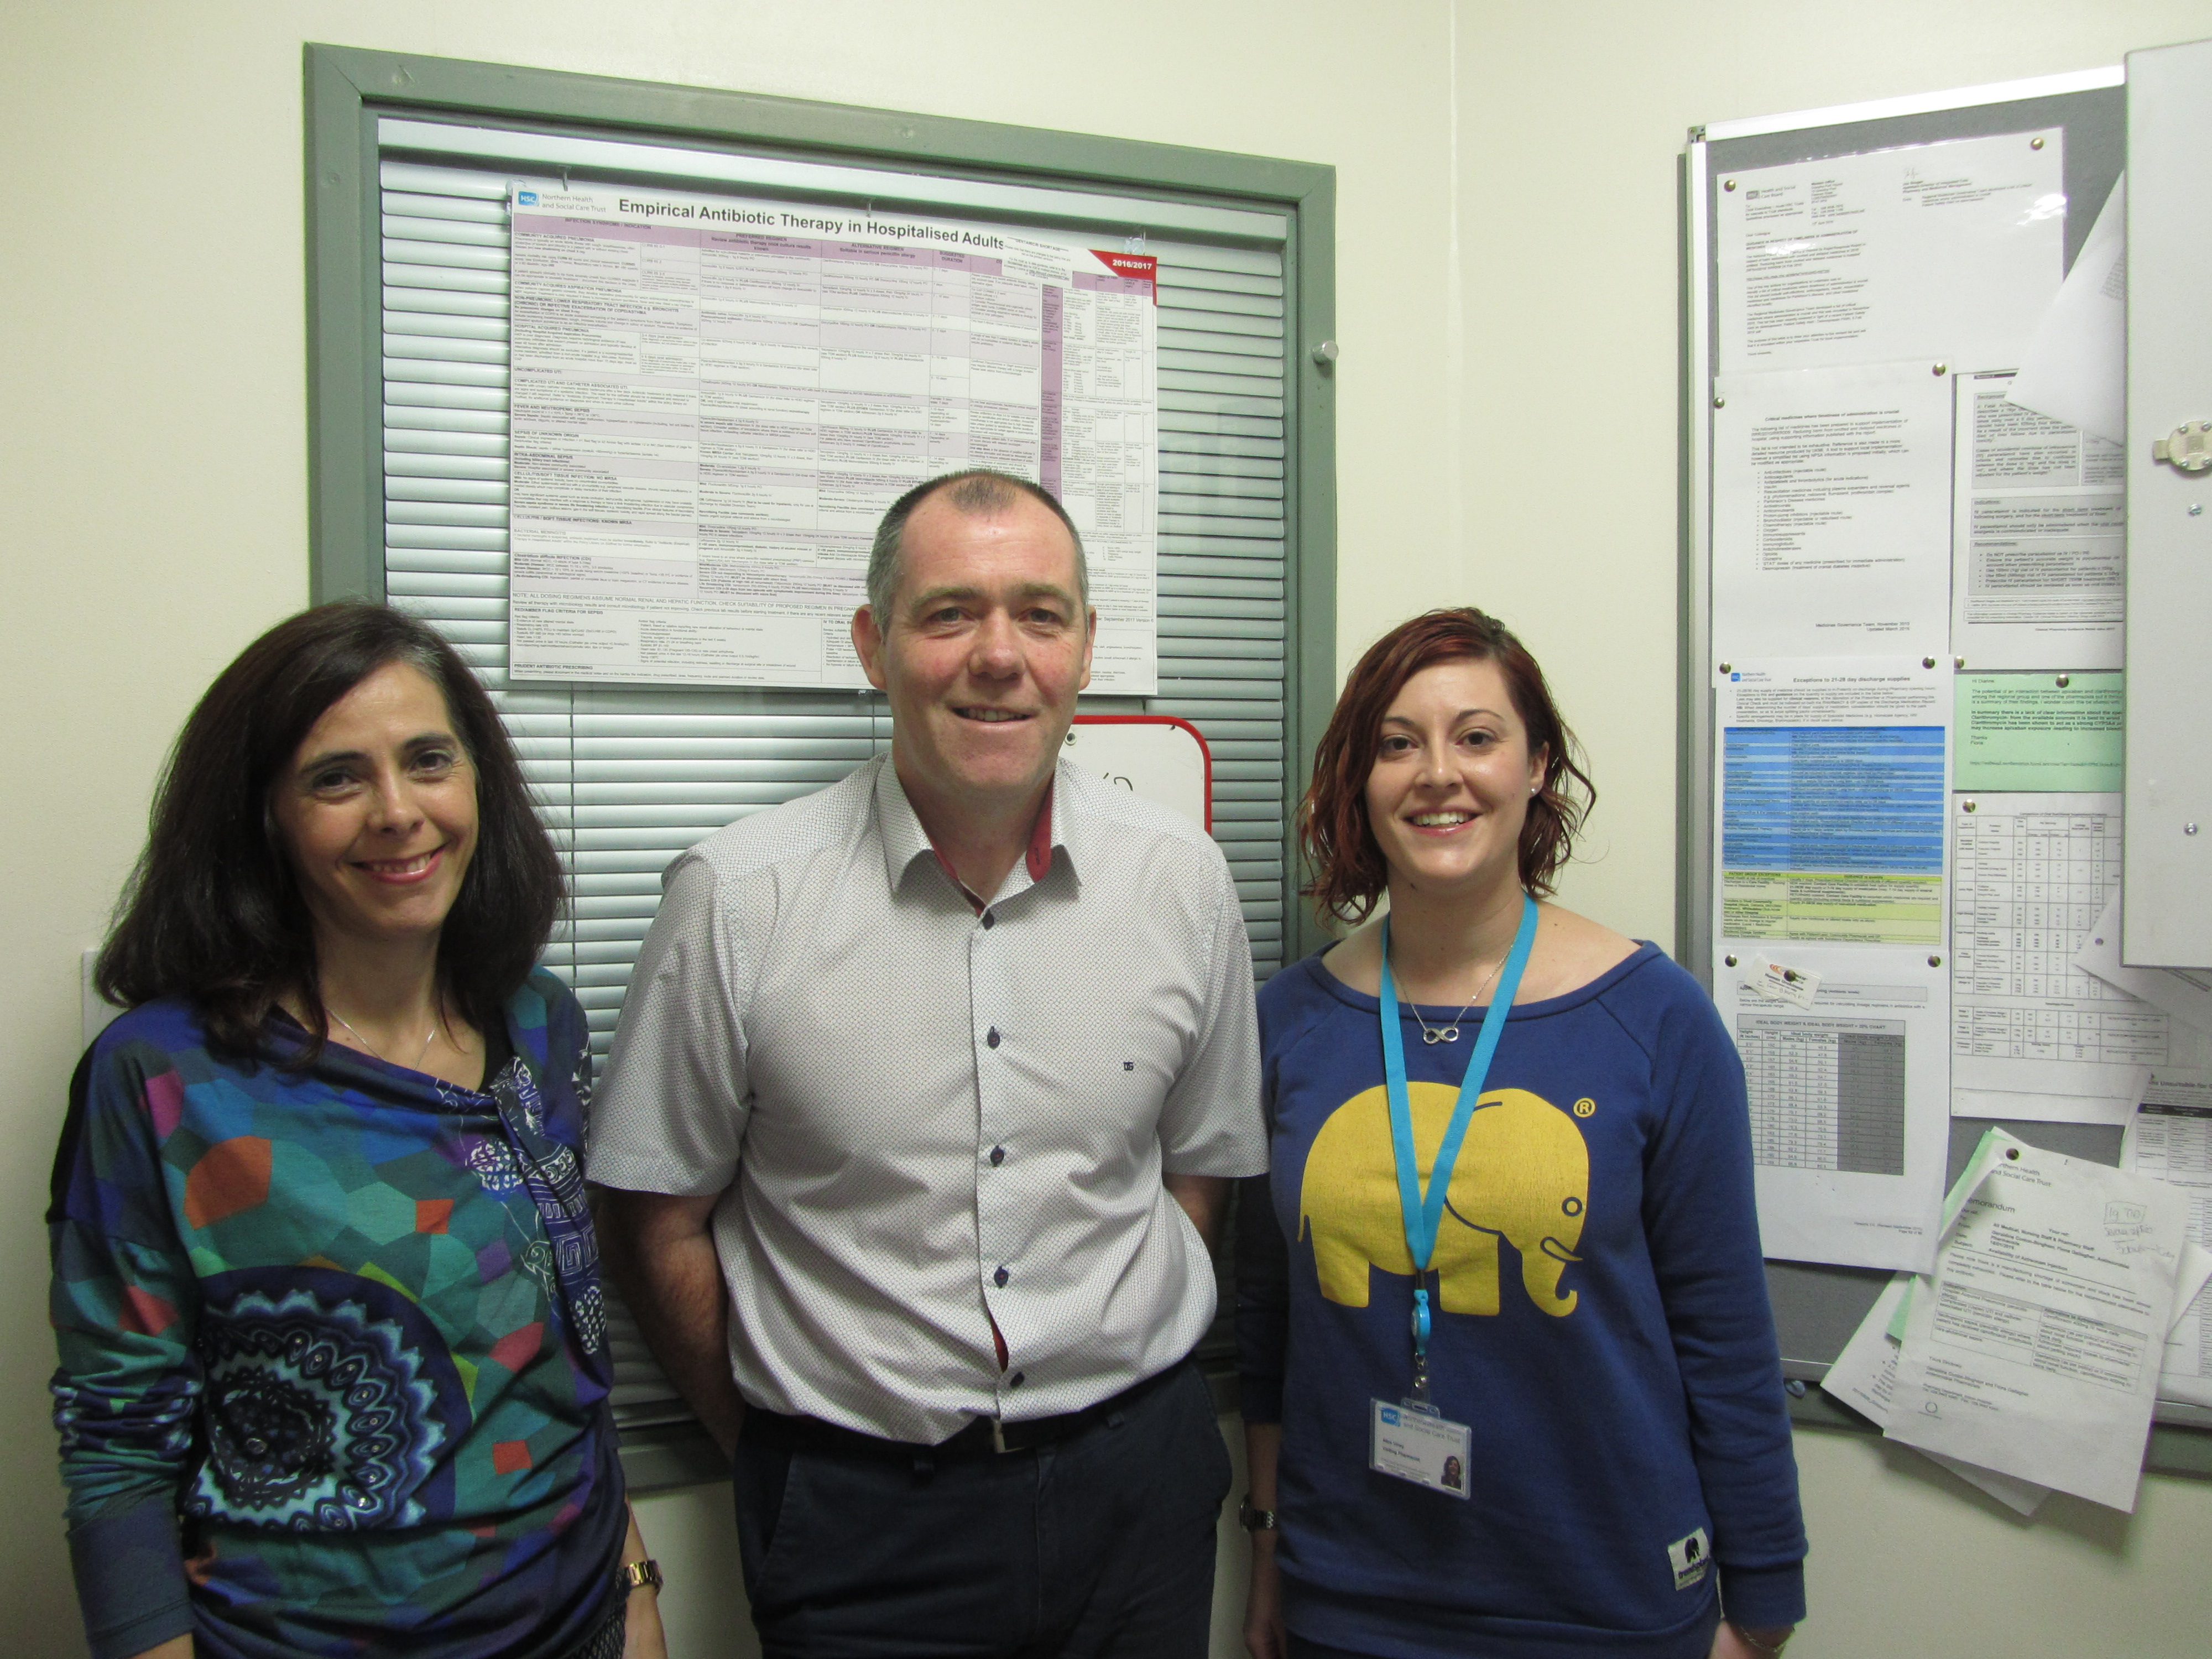 Alice Charlotte Viney, Linden Ashfield, María Teresa Pérez Maroto